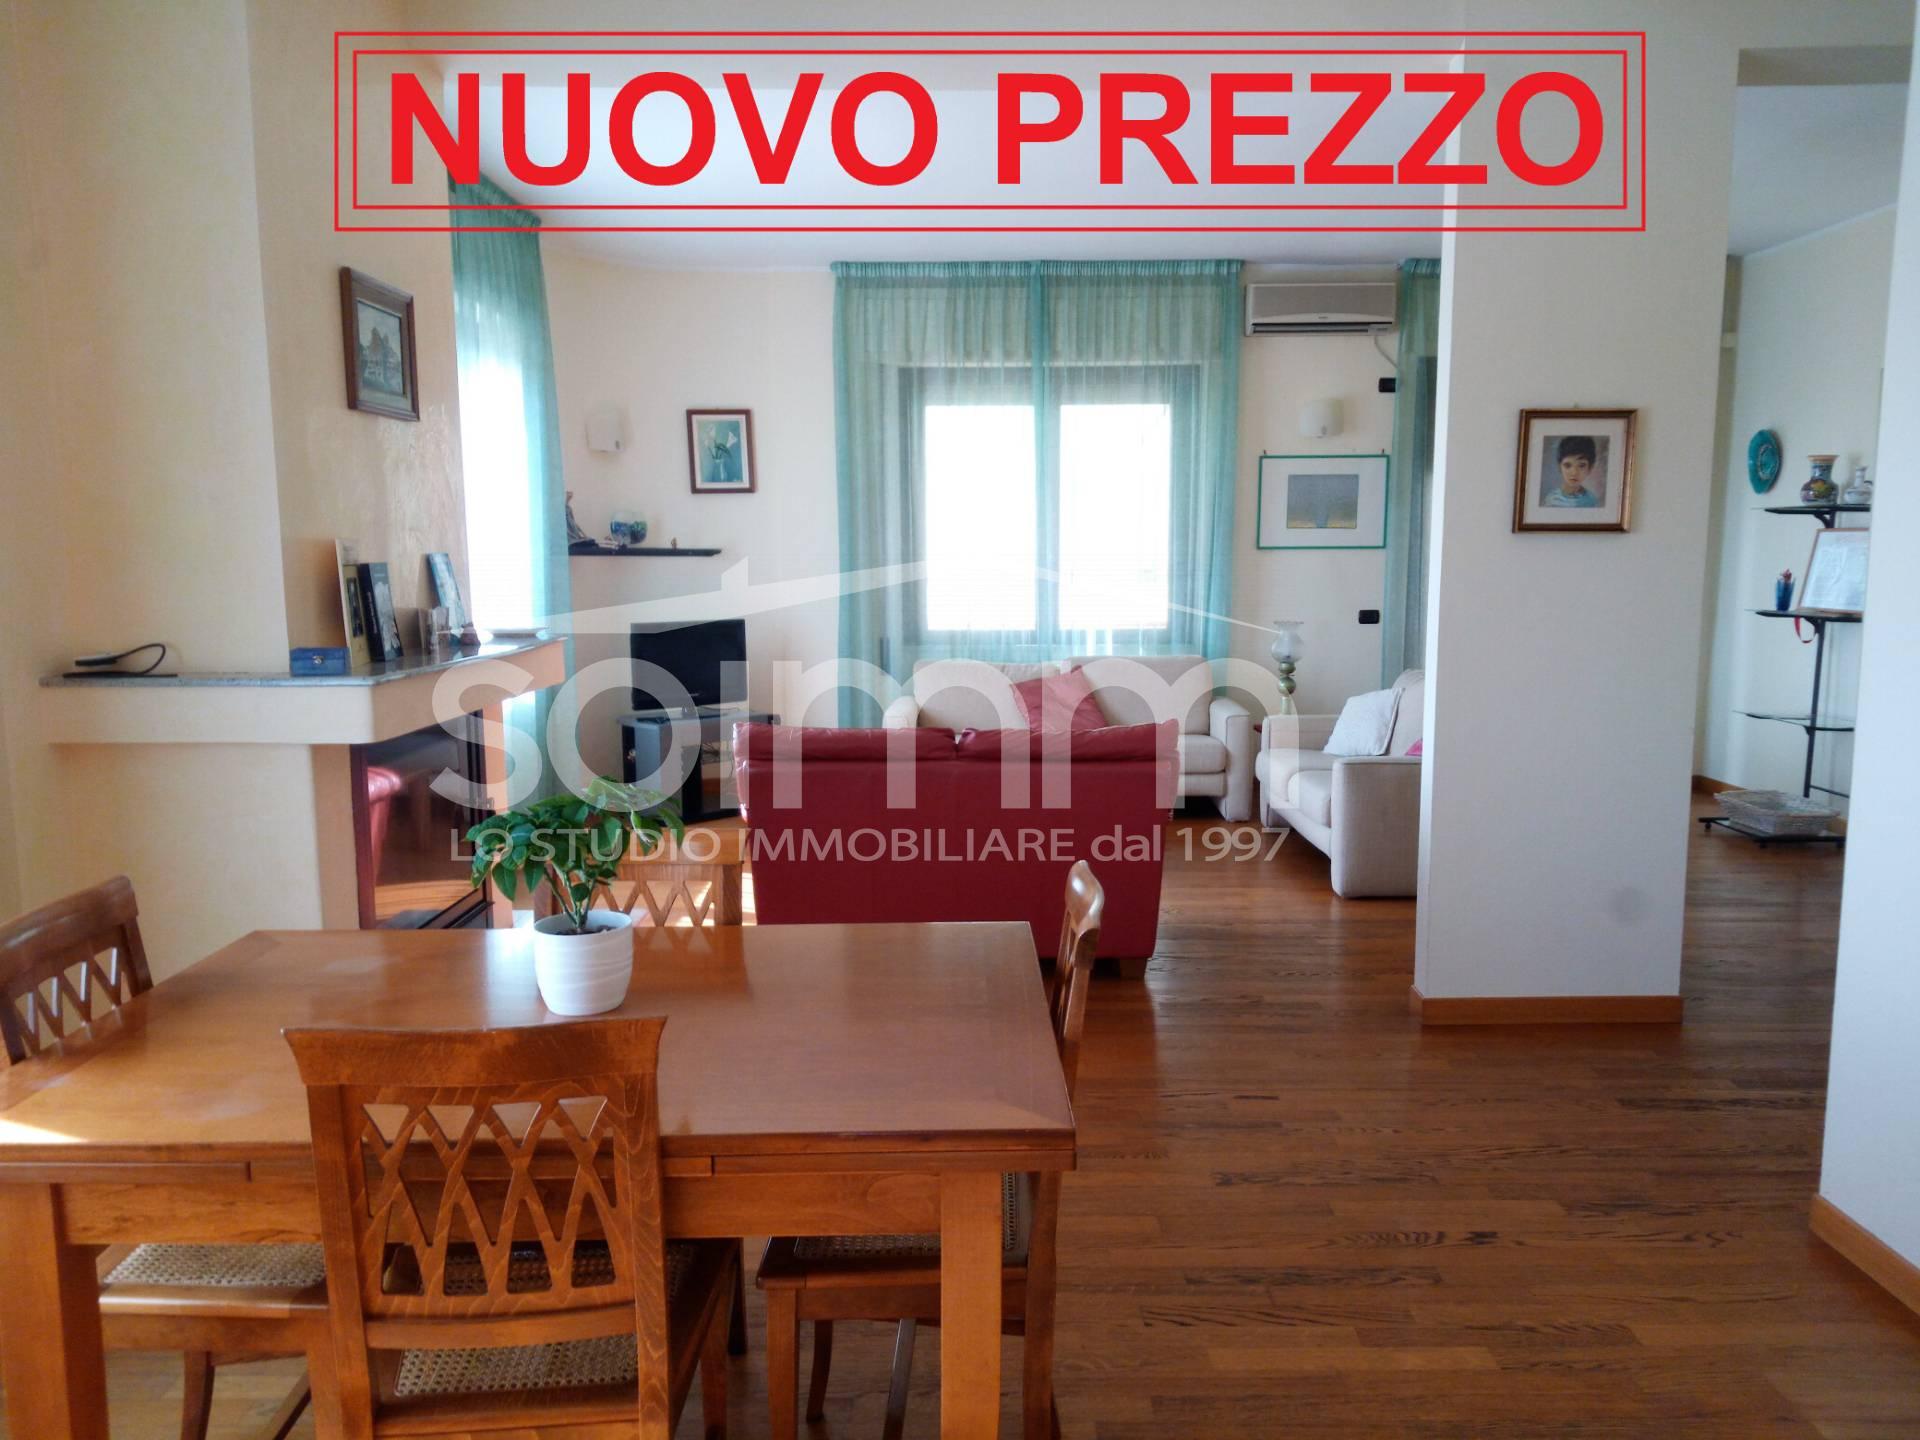 Appartamento in Vendita a Quartu Sant'Elena - Cod. AS68